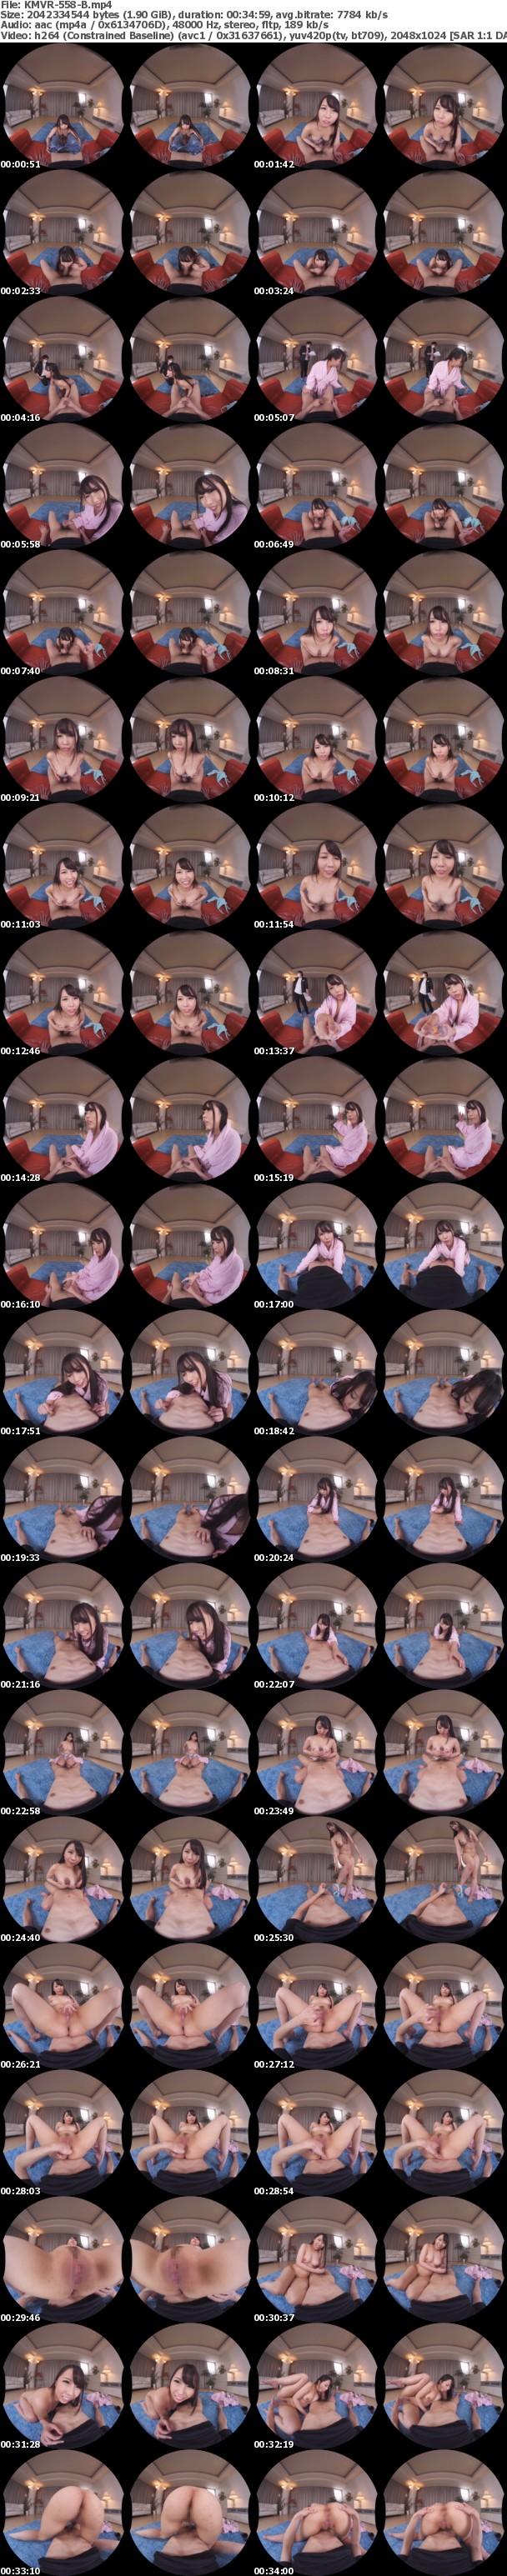 (VR) KMVR-558 リアルAV男優体験!撮影中チンチンが勃起しなくなってVTRストップ!絶体絶命の危機に勃ち待ち中のあなたに天使の玉木くるみちゃんが本当にHなことを… 玉木くるみ